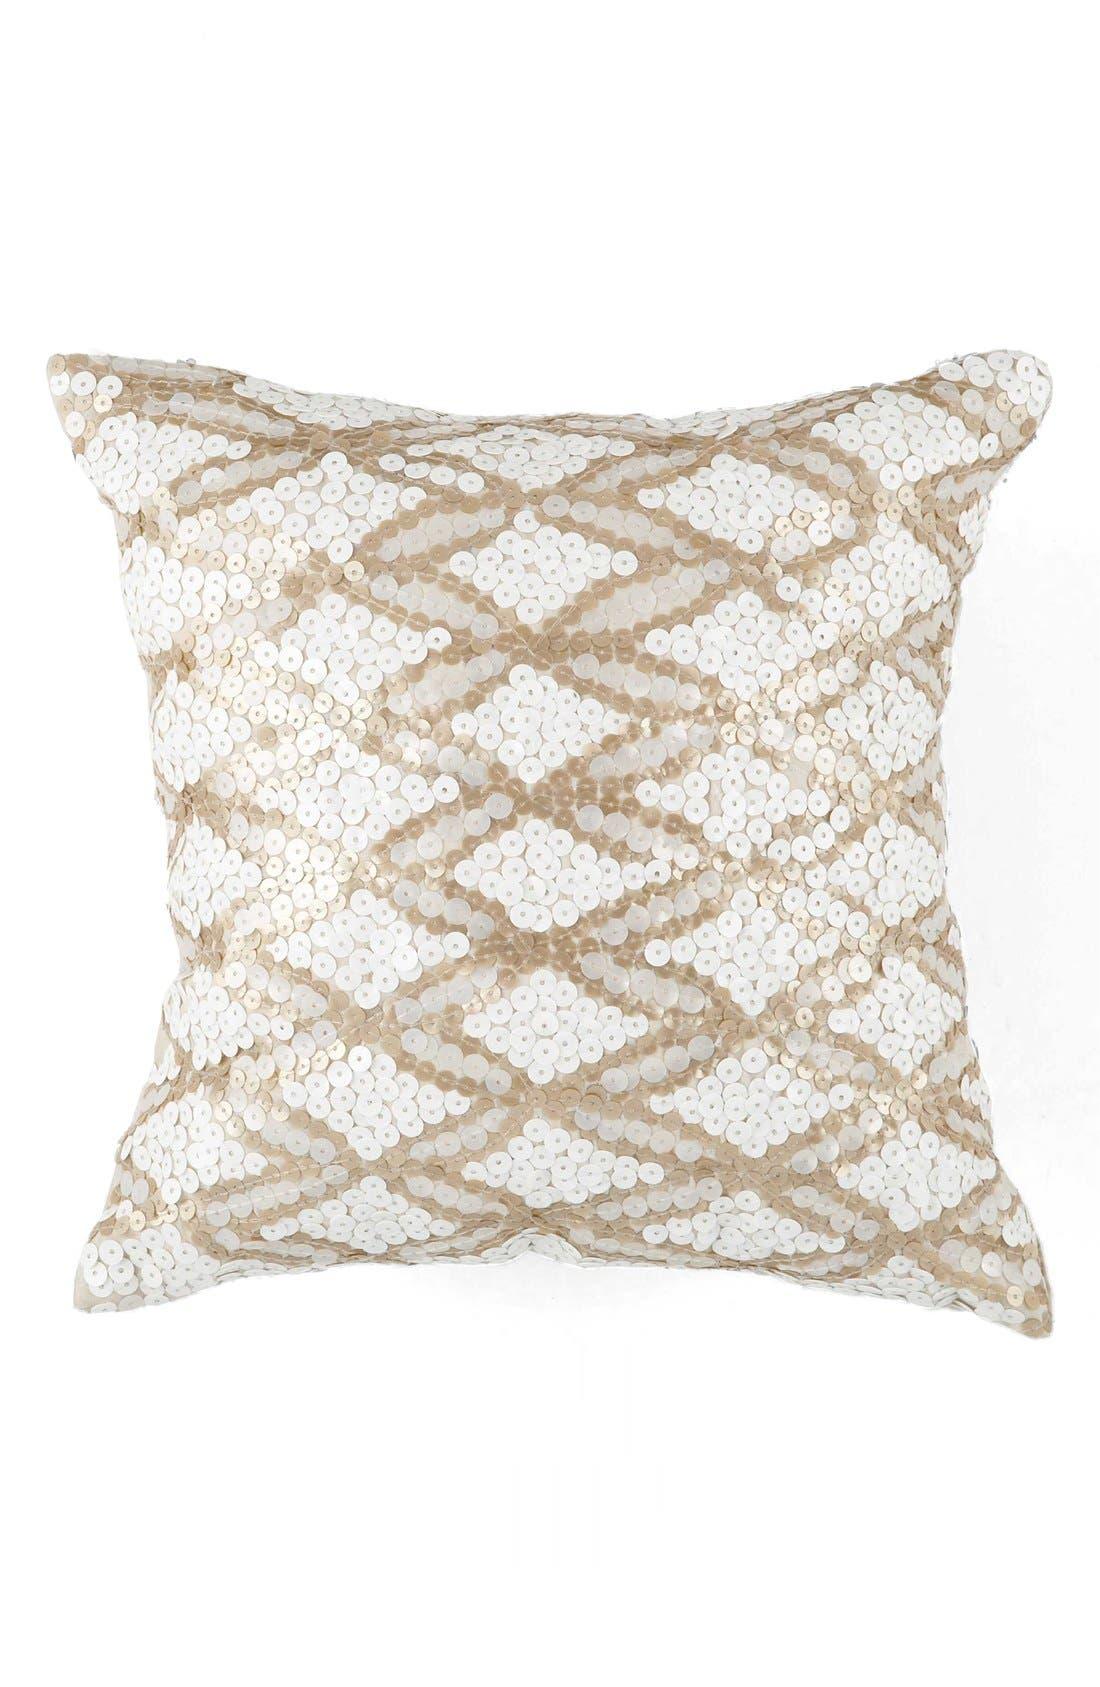 'Gemma' Pillow,                         Main,                         color, 100